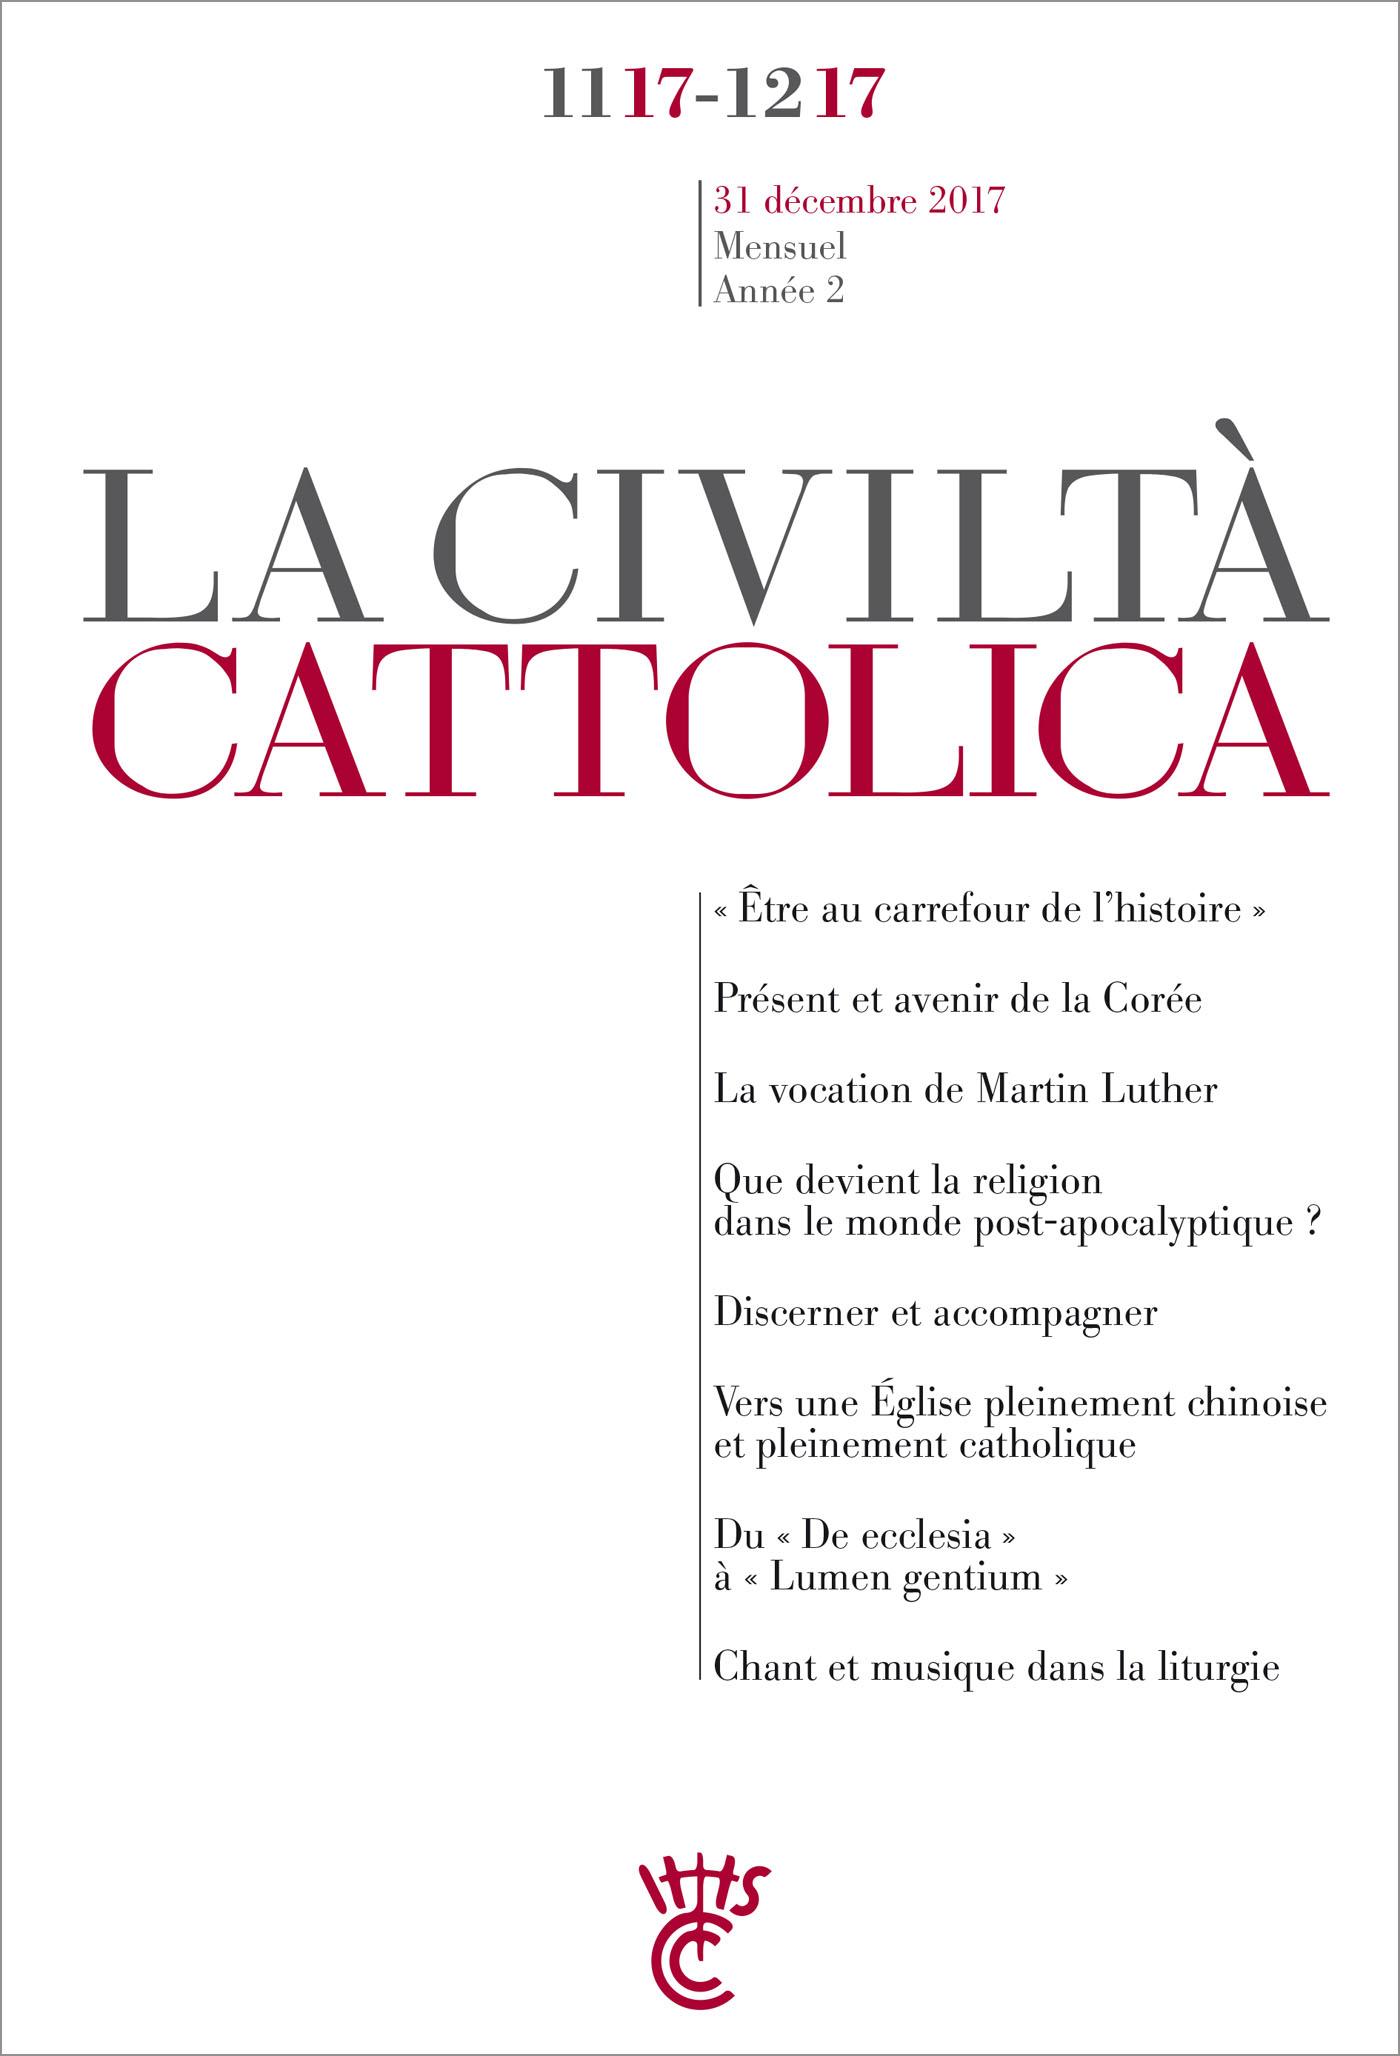 Civiltà Cattolica Novembre-Décembre 2017